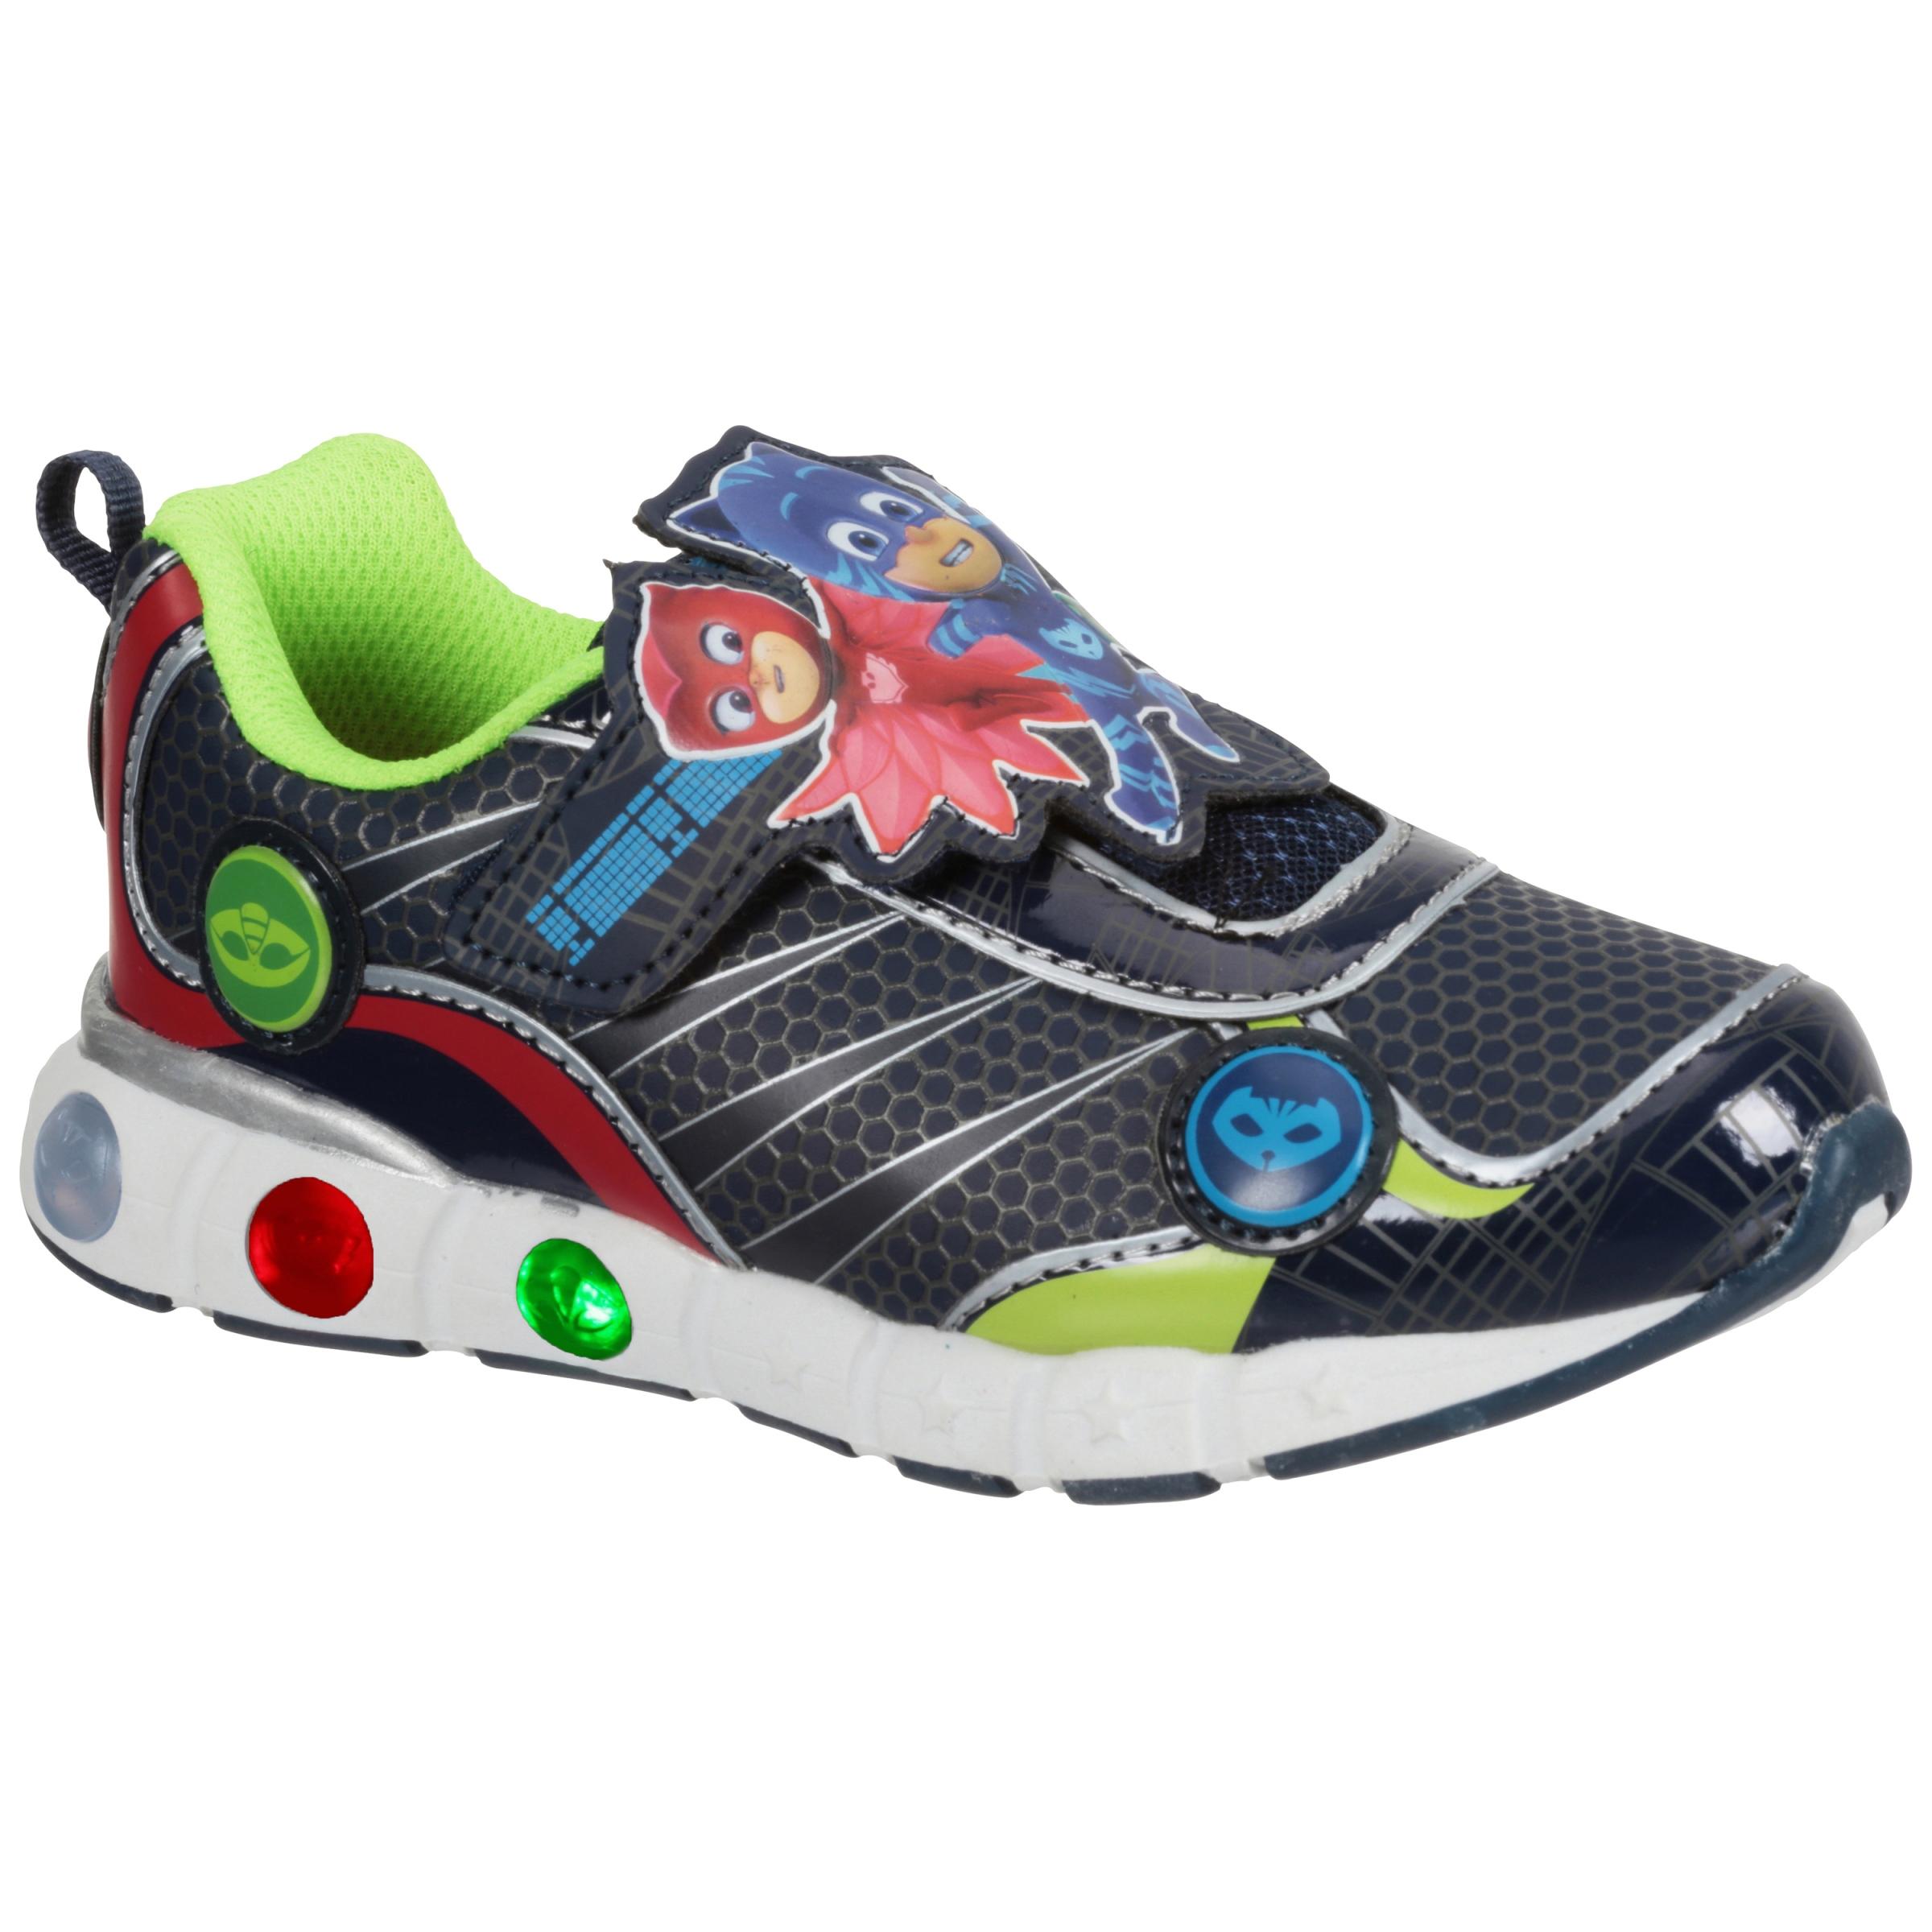 Century 505 Green Running Shoes